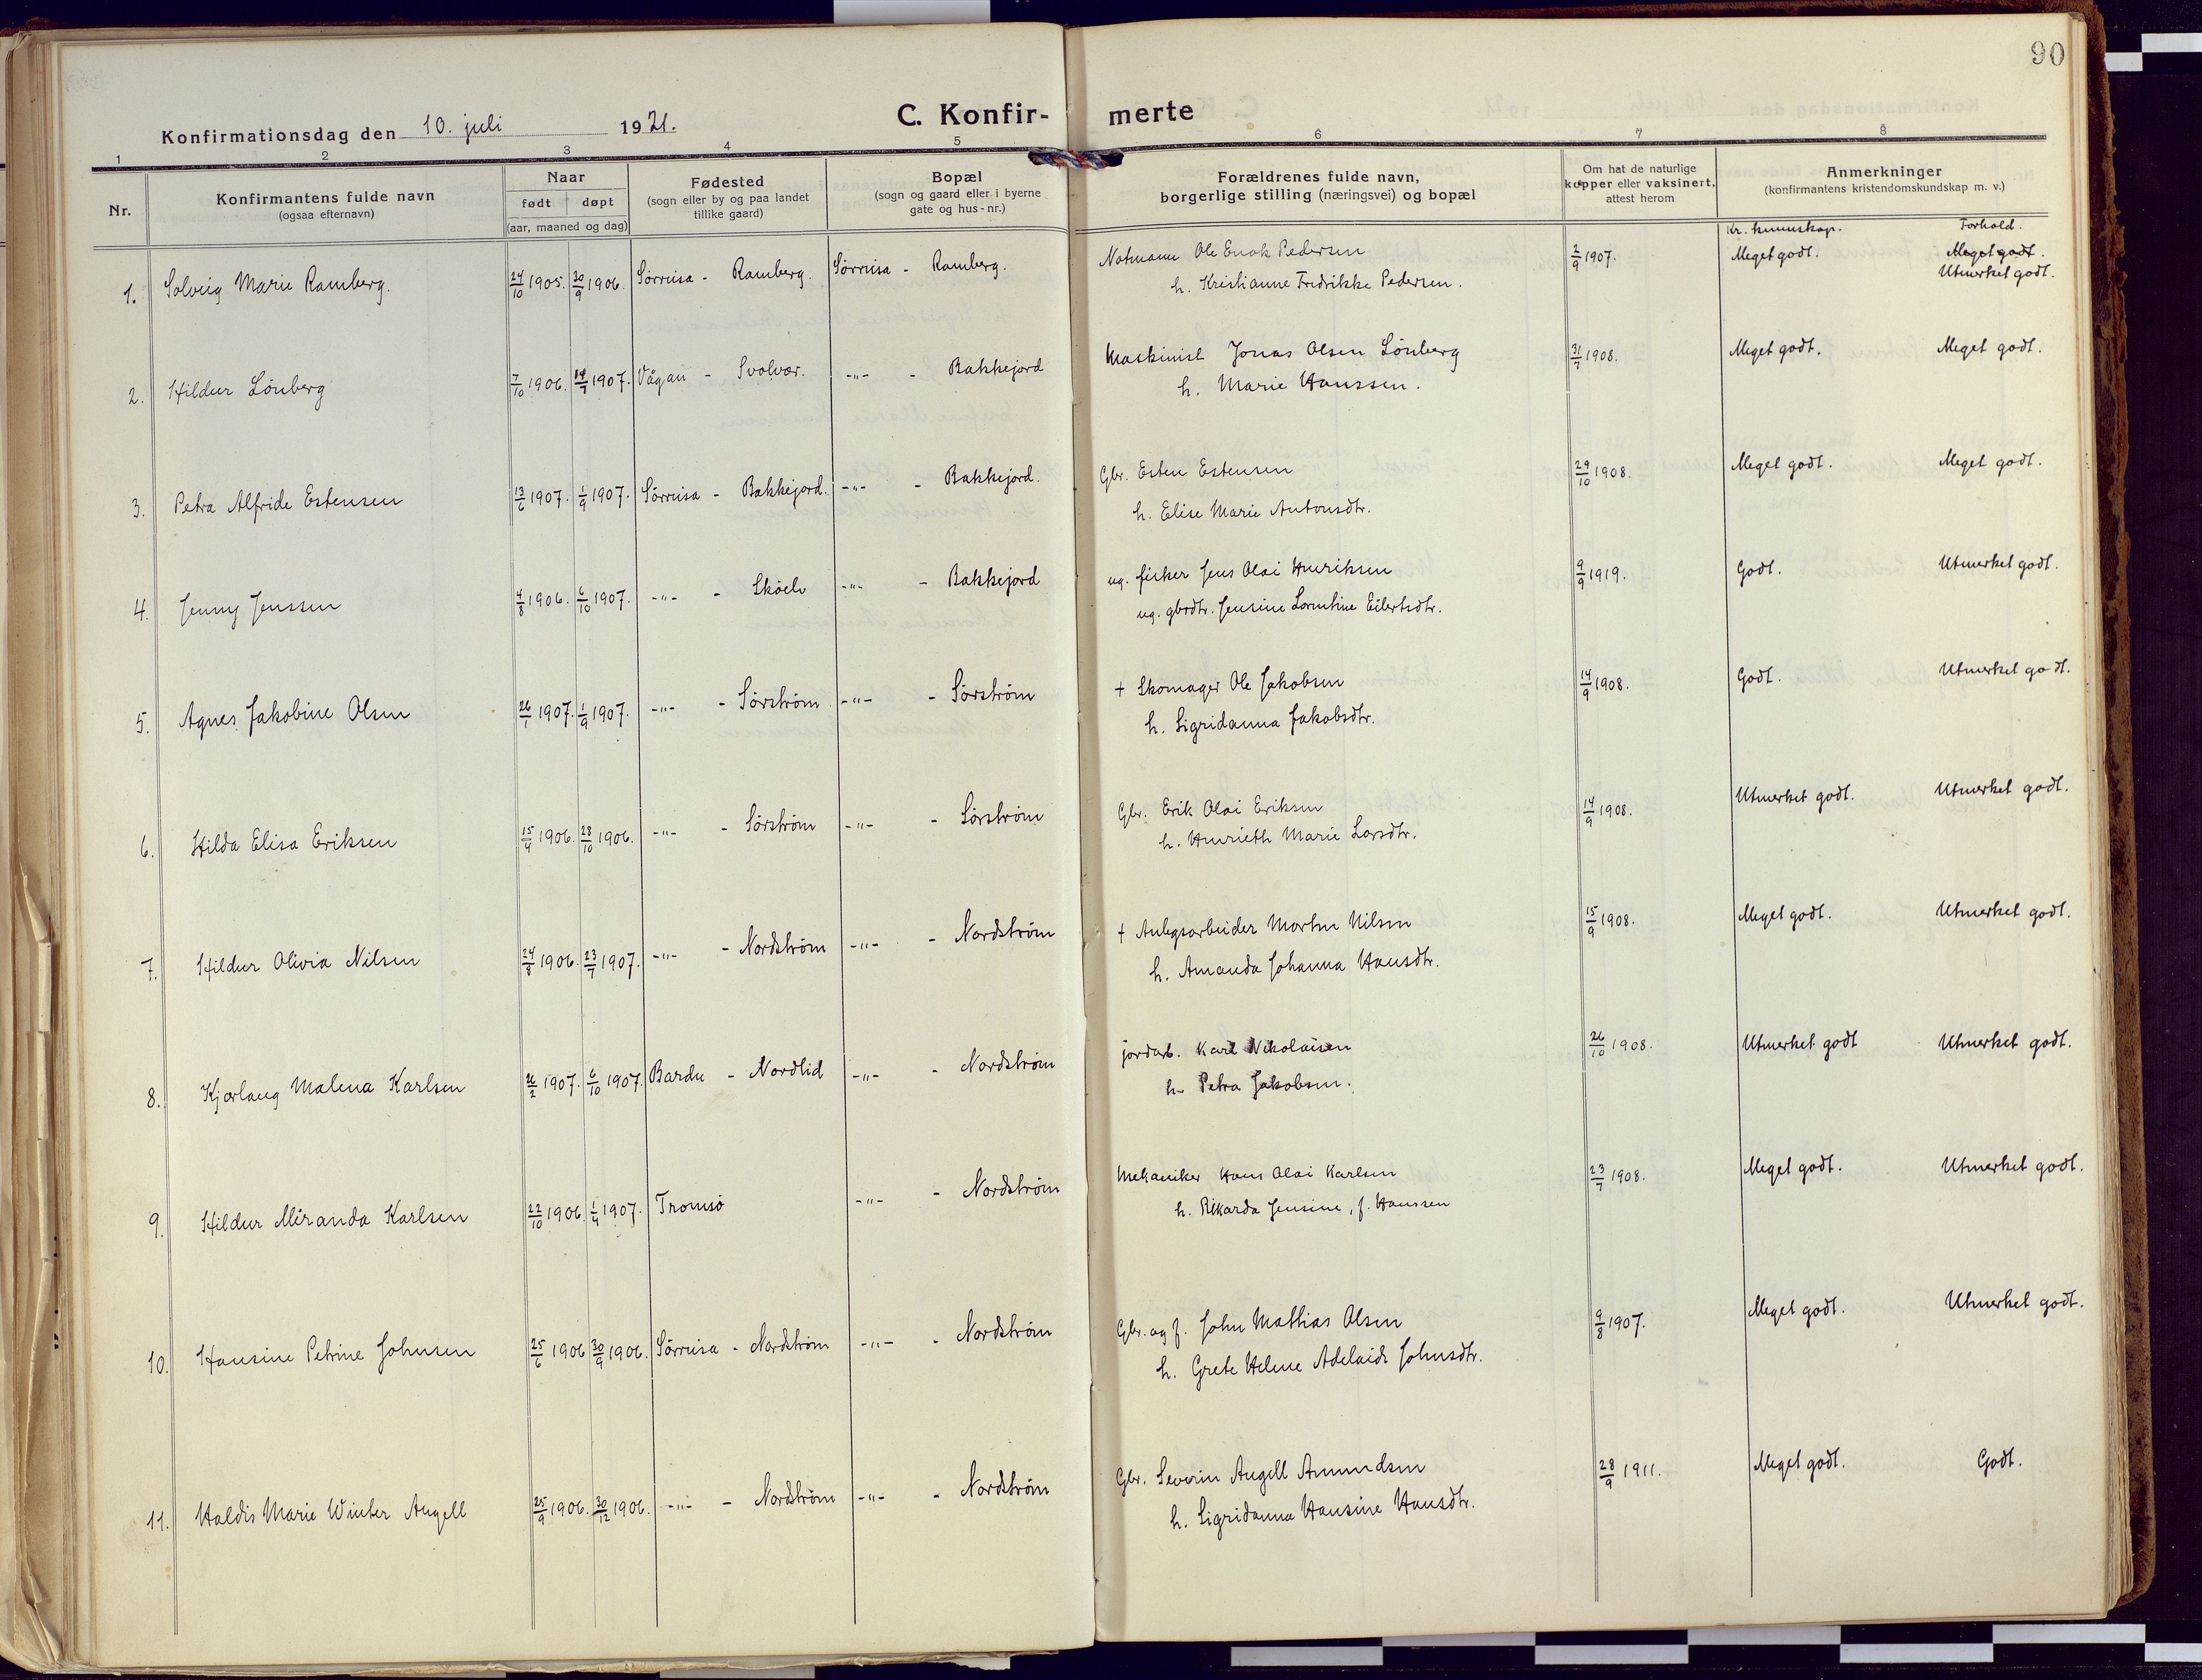 SATØ, Tranøy sokneprestkontor, I/Ia/Iaa/L0015kirke: Ministerialbok nr. 15, 1919-1928, s. 90